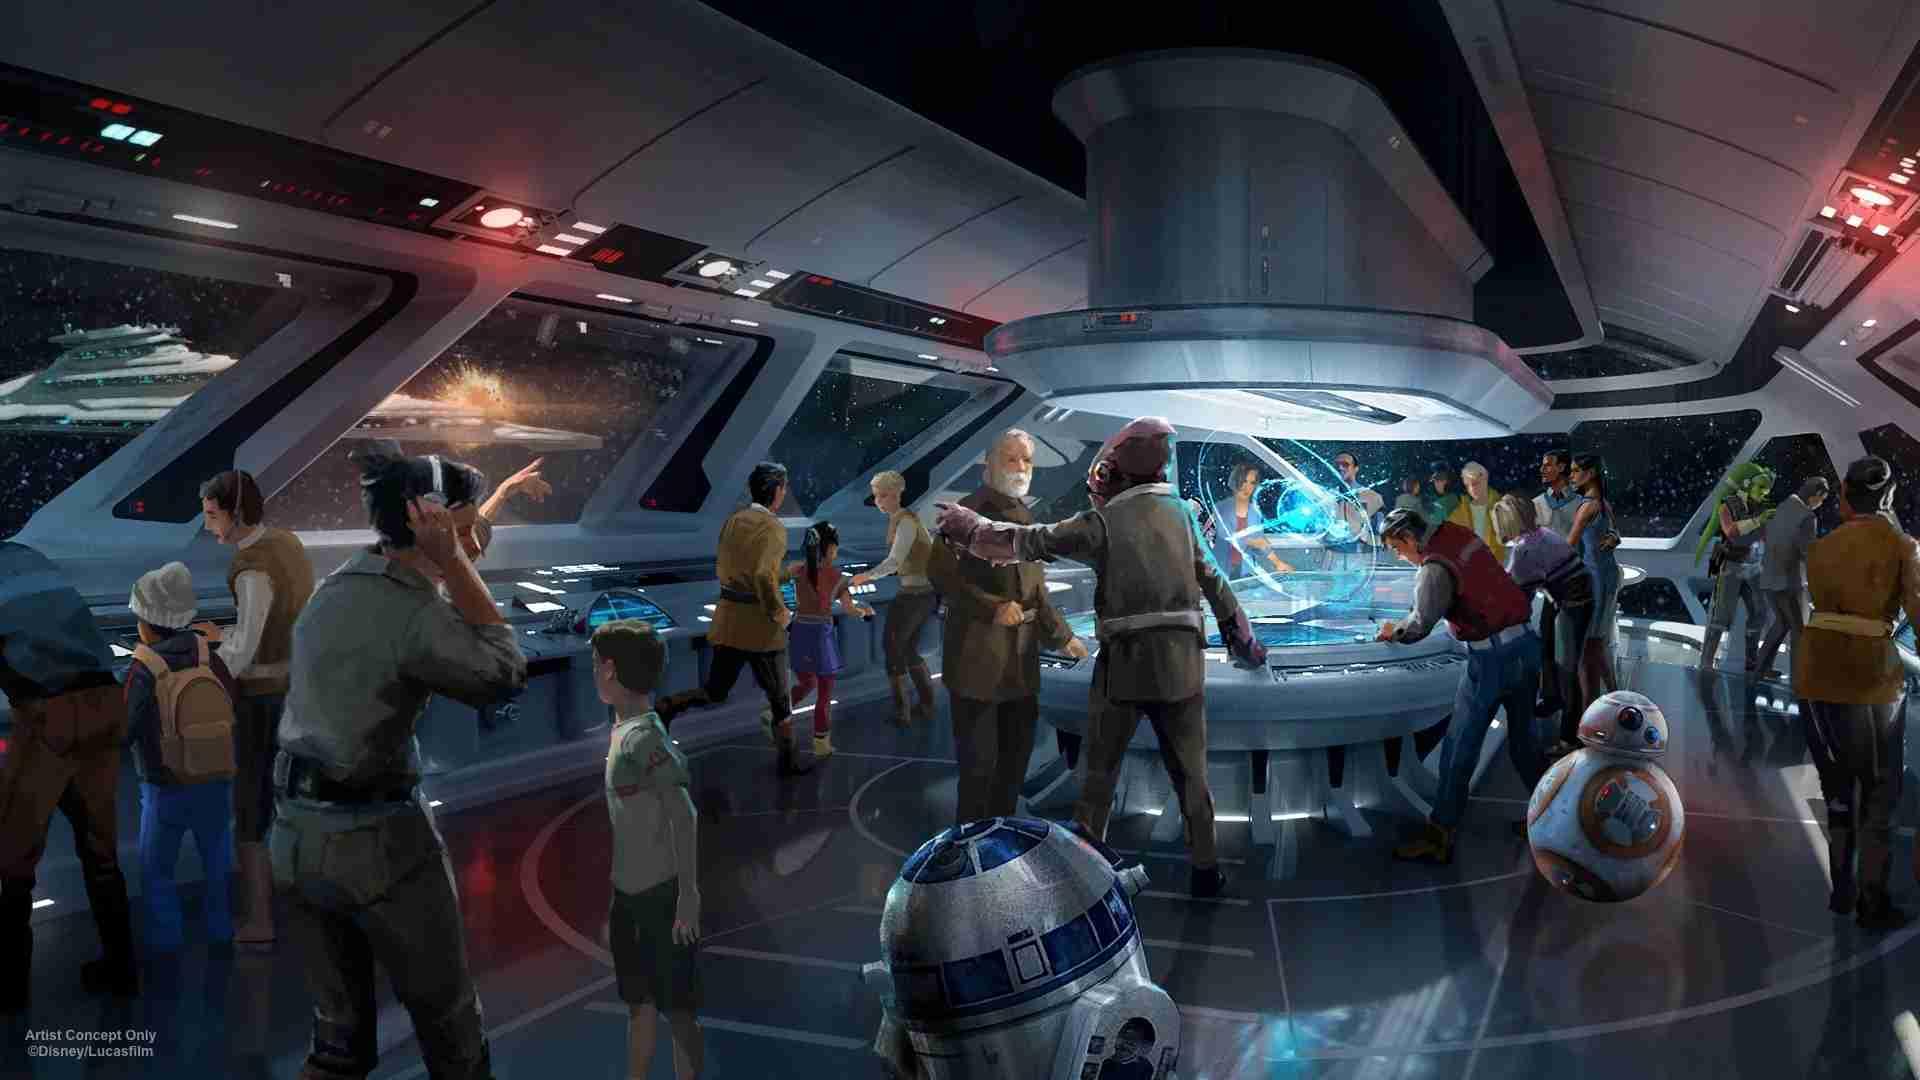 Image Courtesy of Disney/Lucasfilm